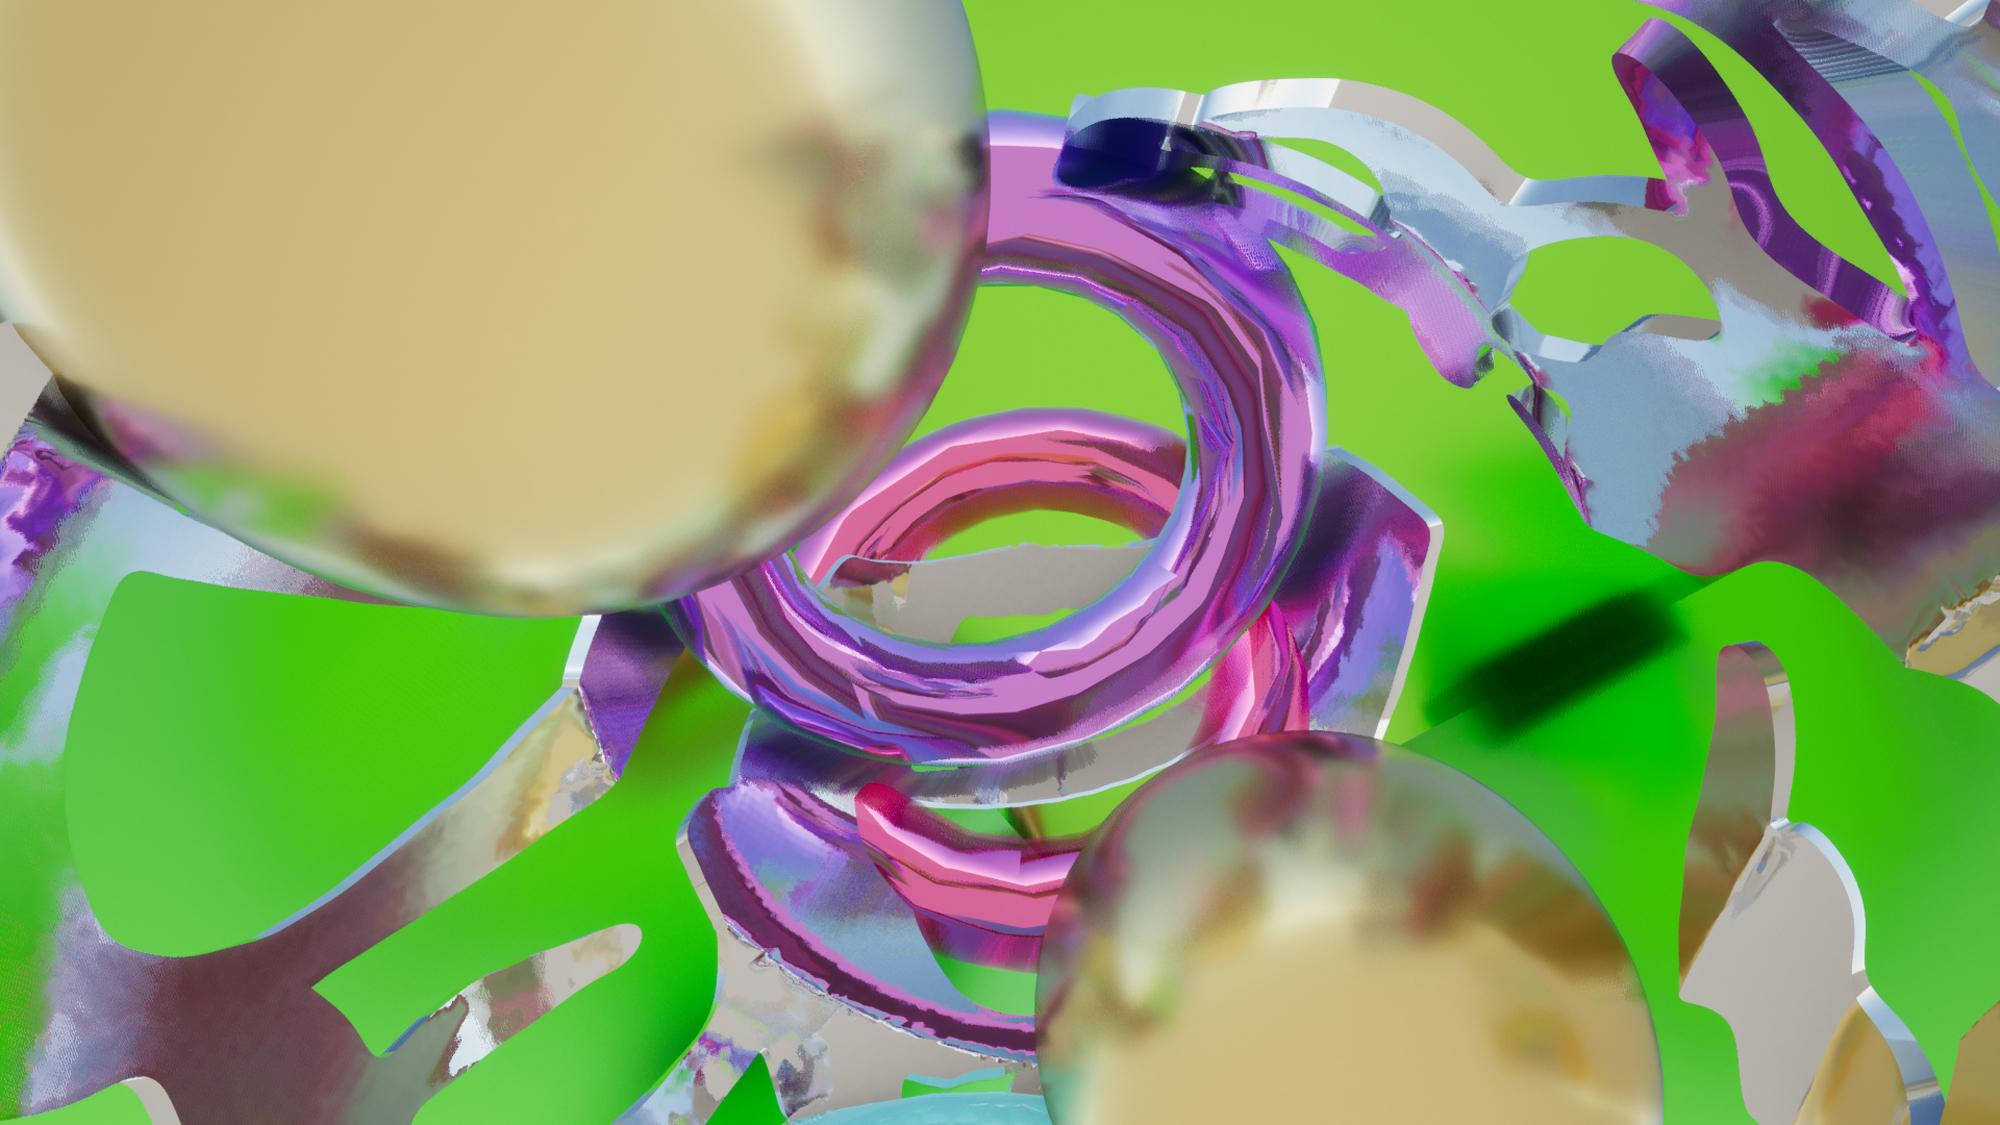 green purple chrome rings floating